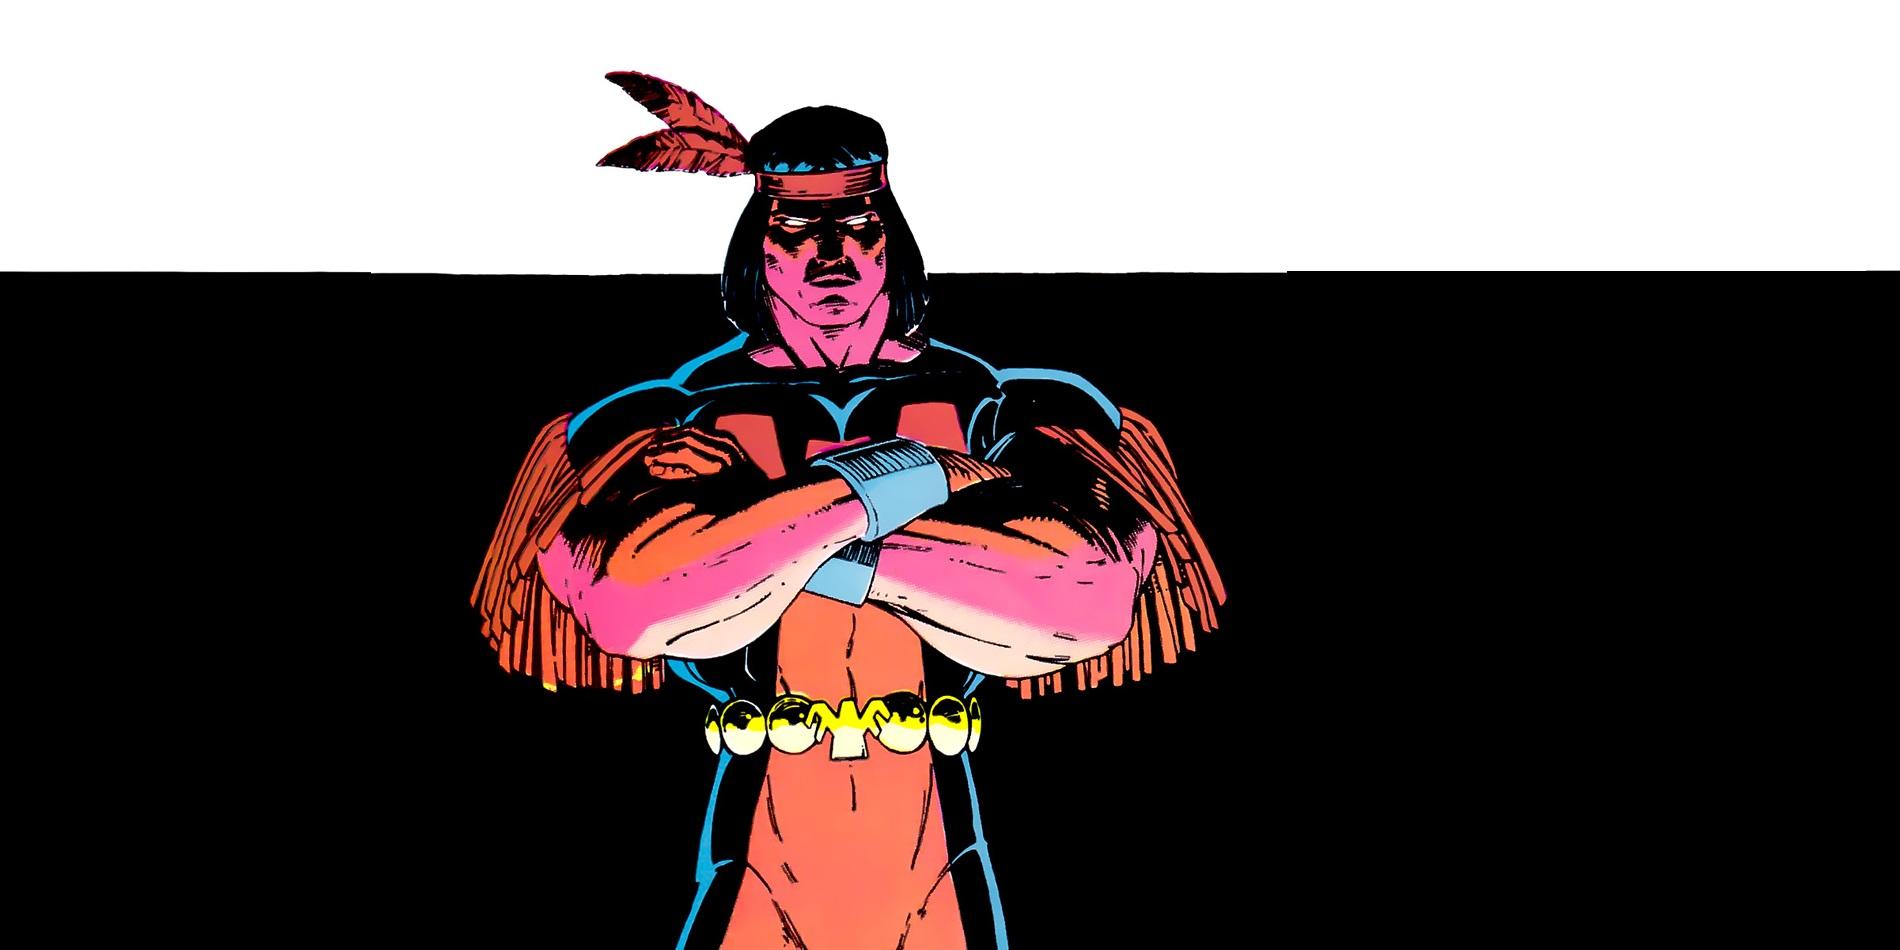 The gifted : Xmen serie spin off (Pilote realisé par Bryan Singer!) Thunderbird-Marvel-Weirdest-Heroes